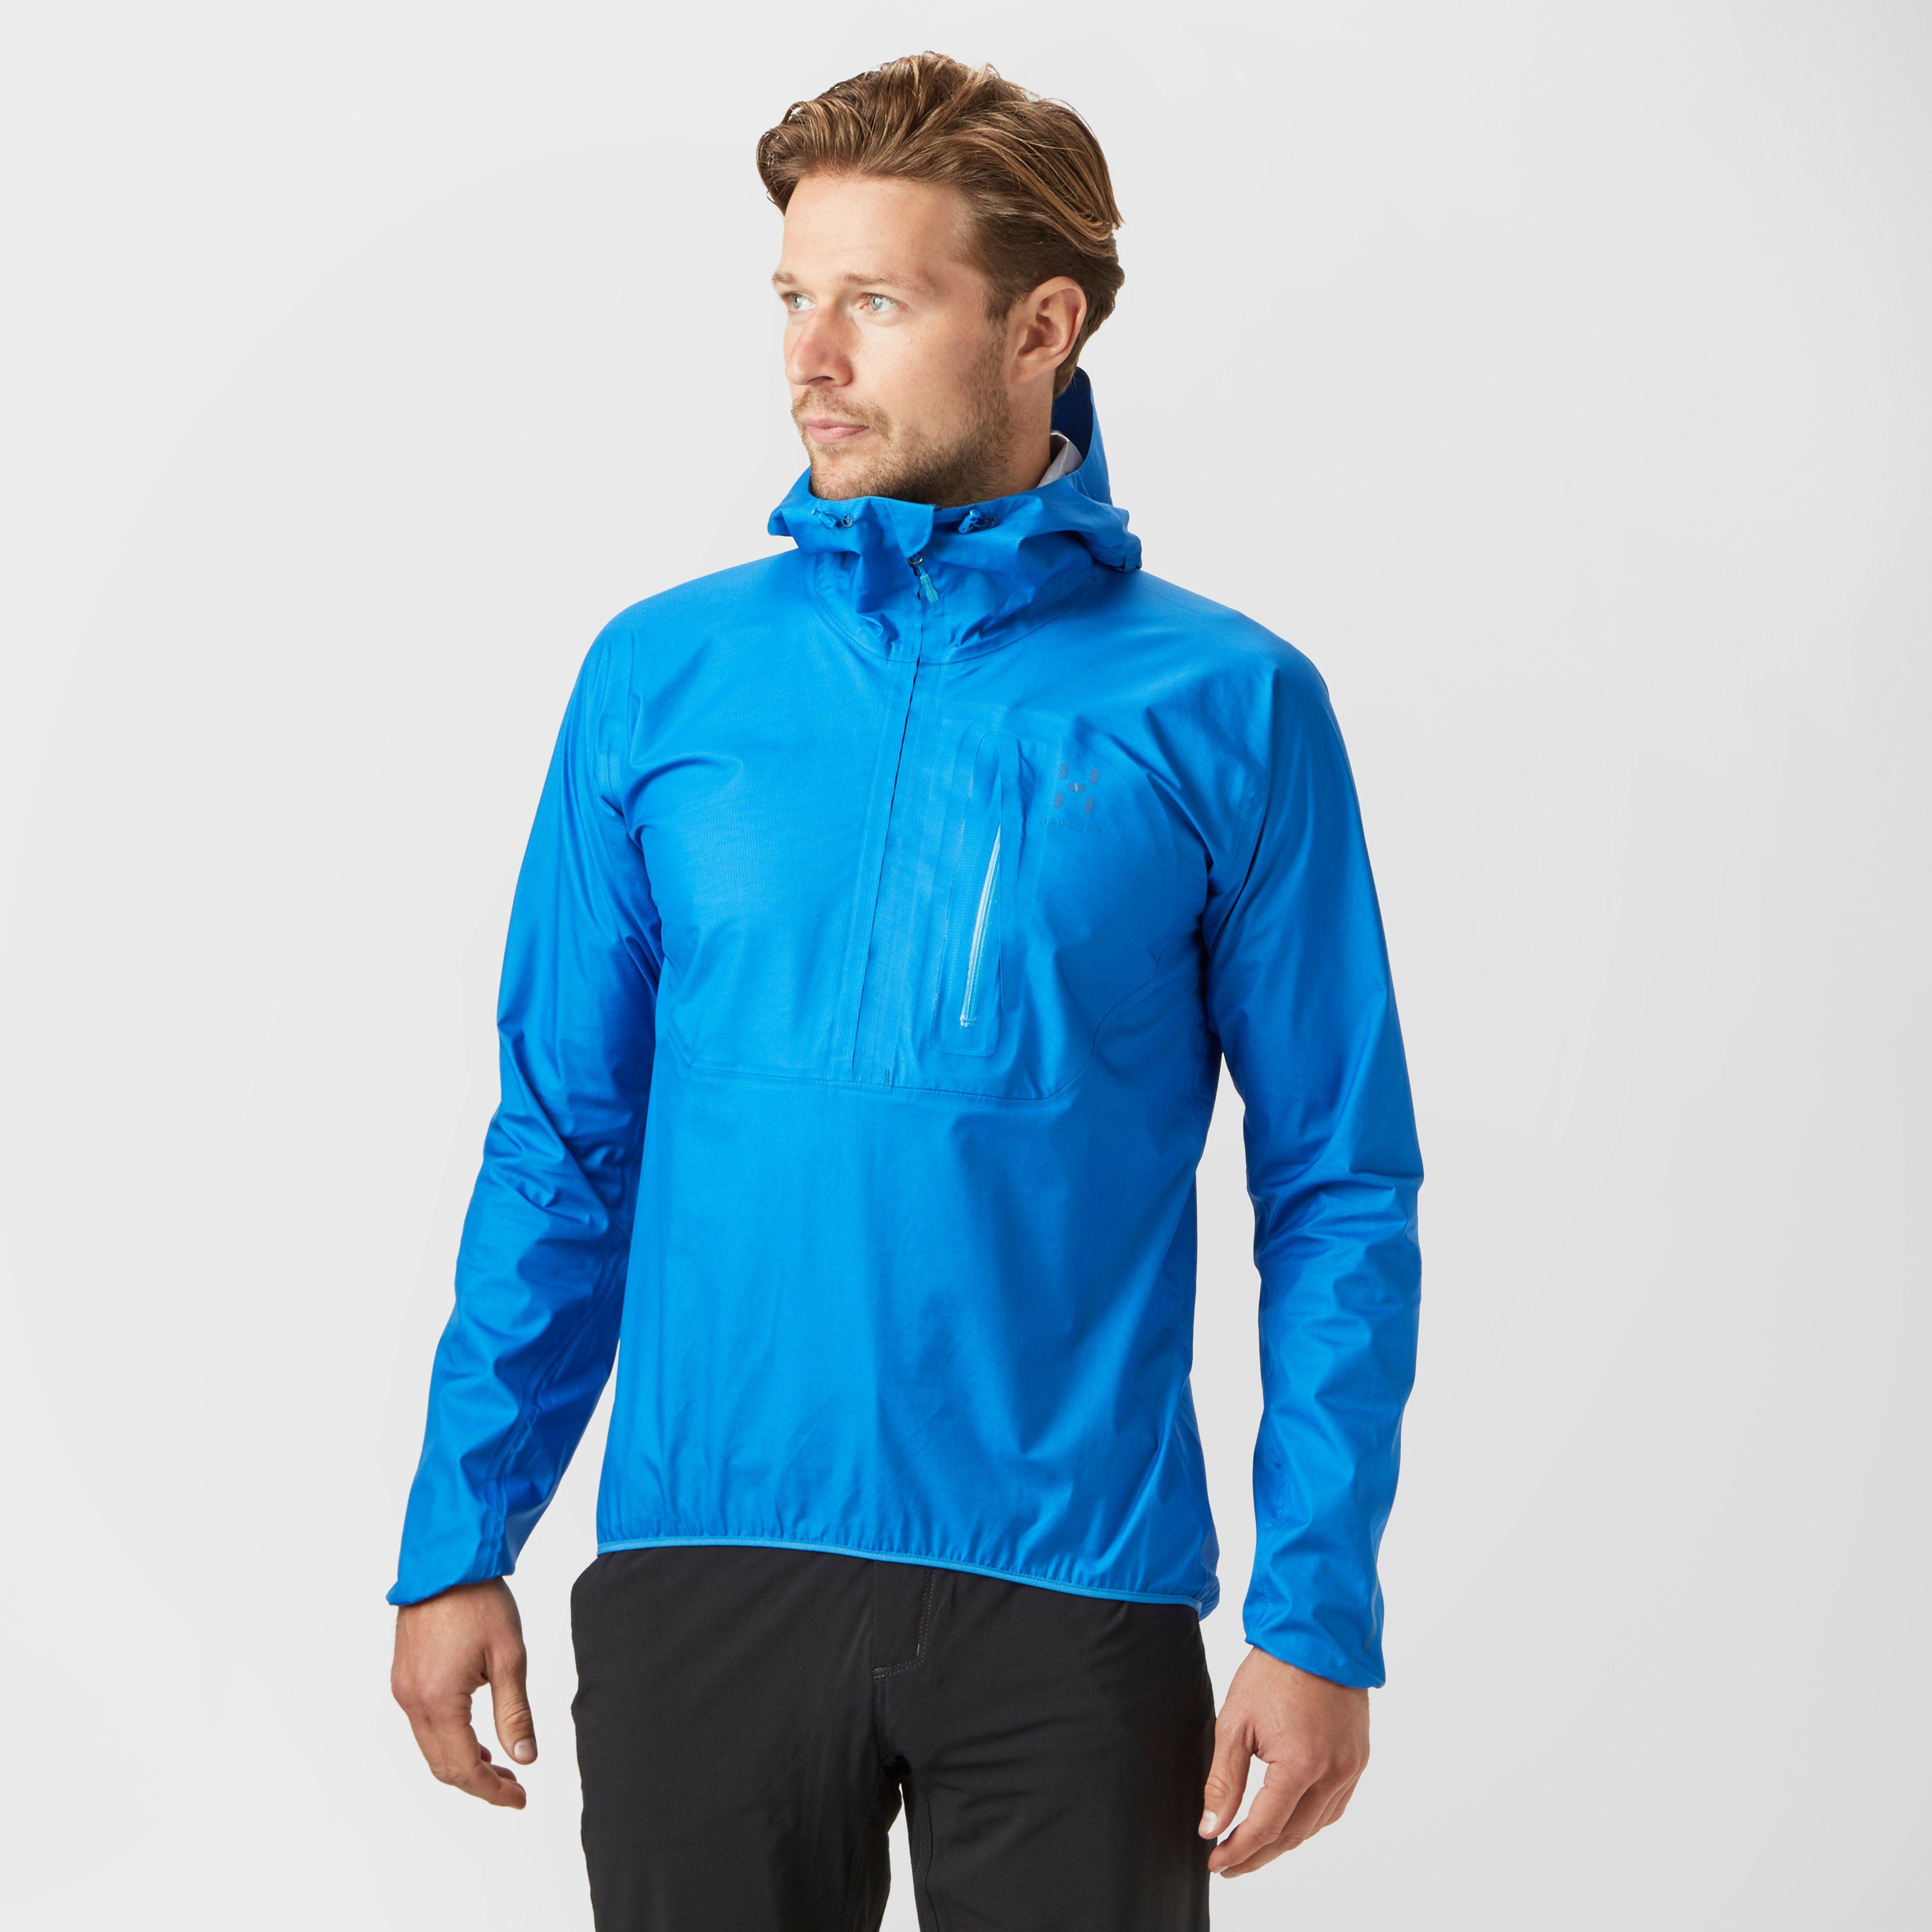 HAGLOFS Men's Gram Comp Pull Over GORE-TEX® Active Jacket